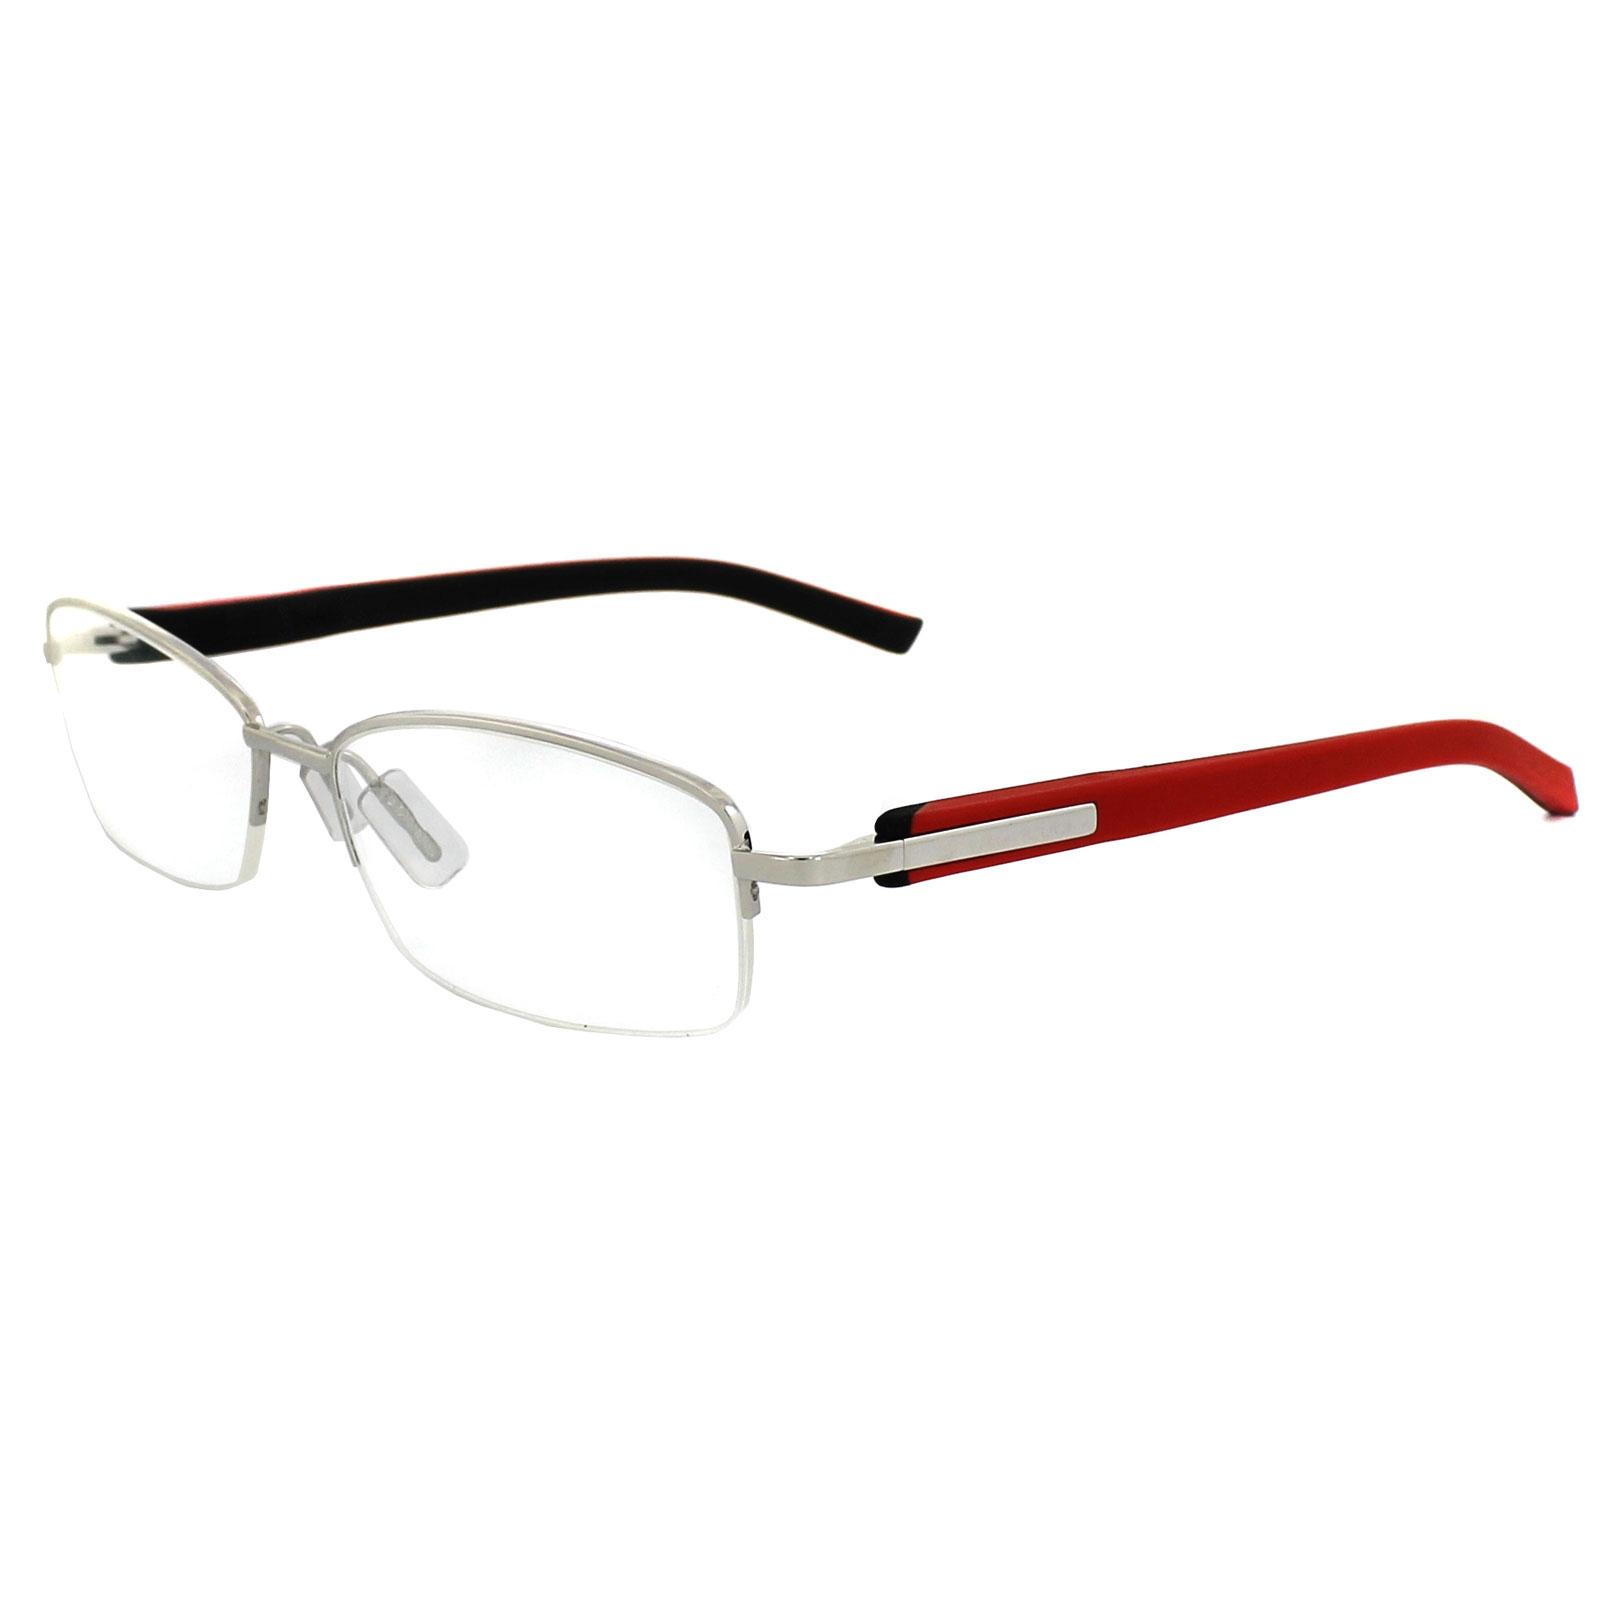 Black Frame Glasses Trend : Cheap Tag Heuer Glasses Frames Trends 8210 005 Silver ...